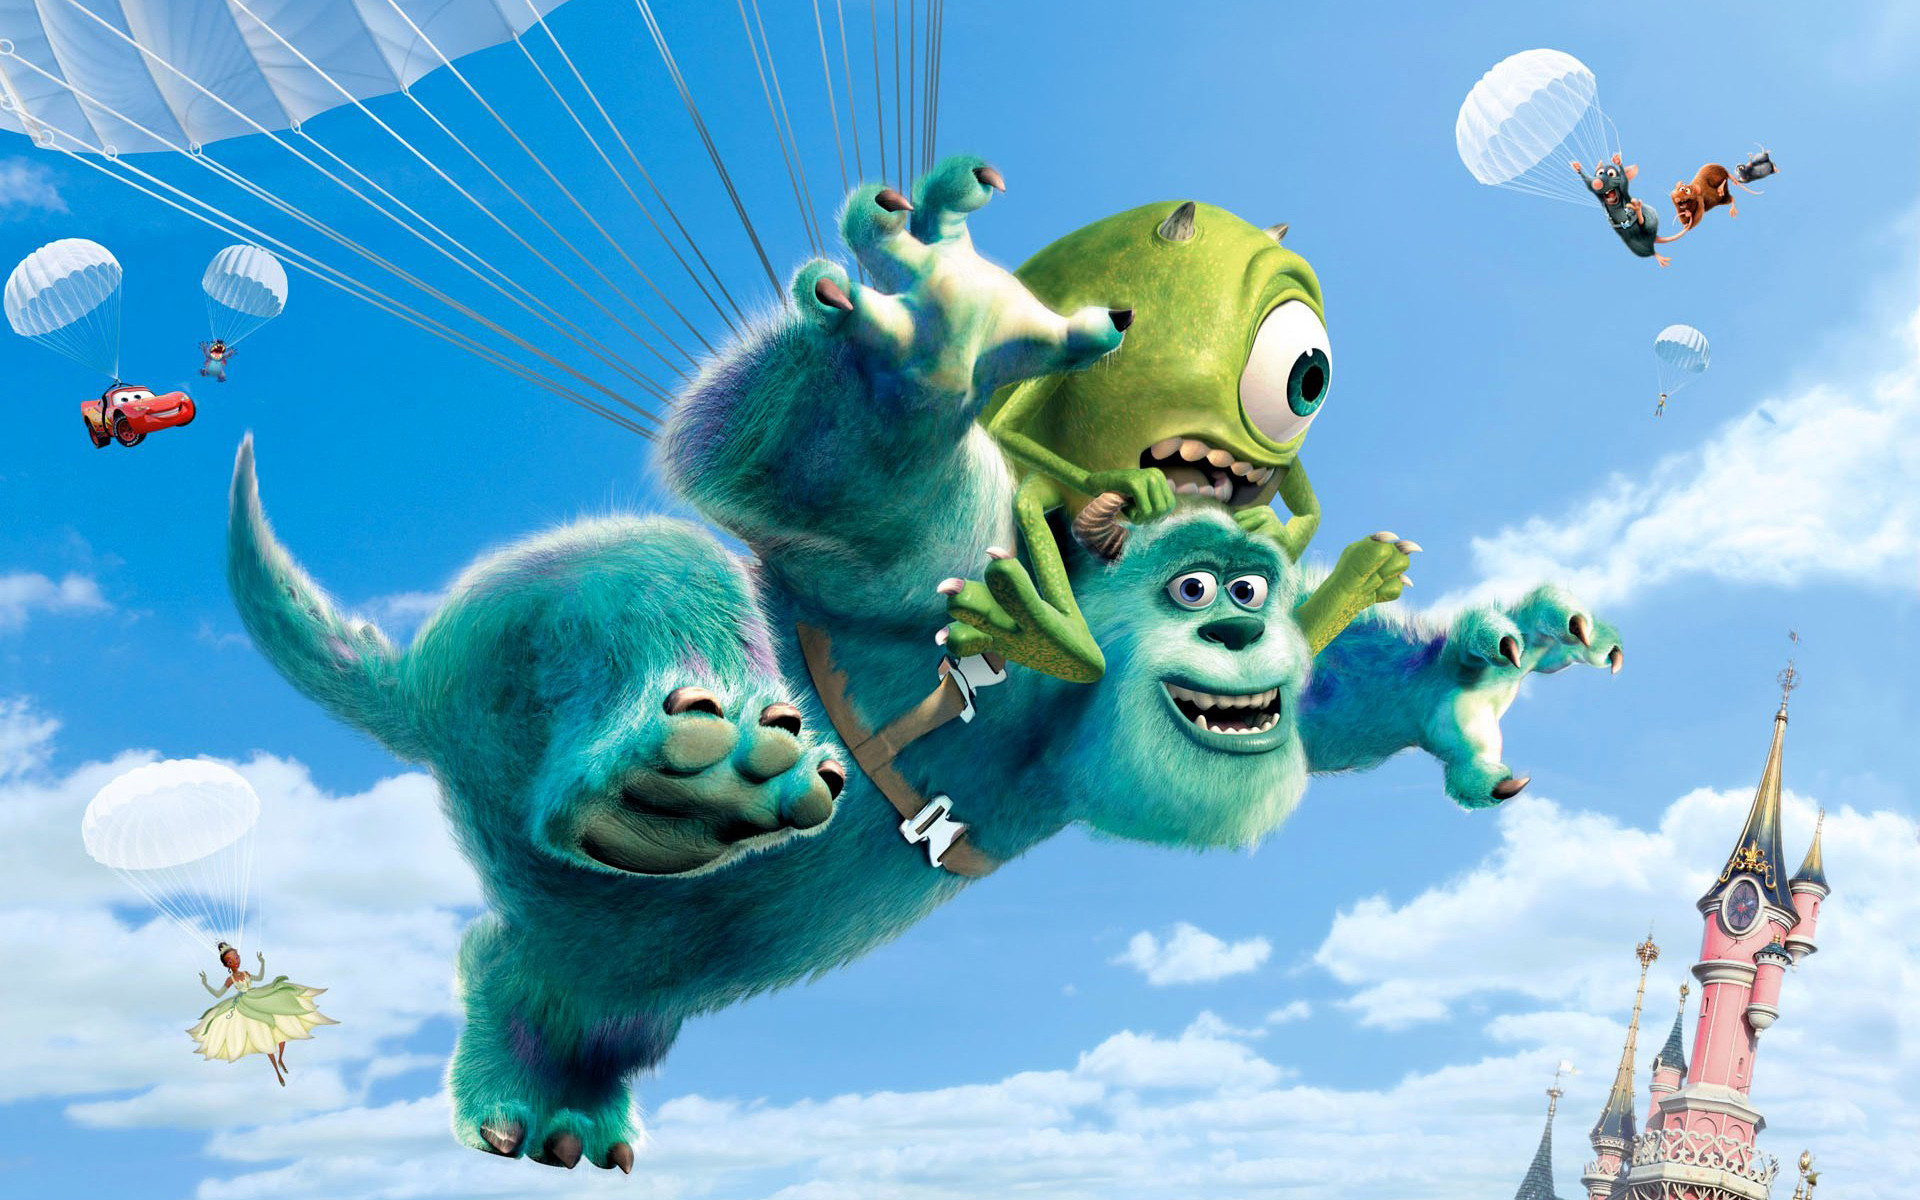 Res: 1920x1200, Disney Movies Monsters University